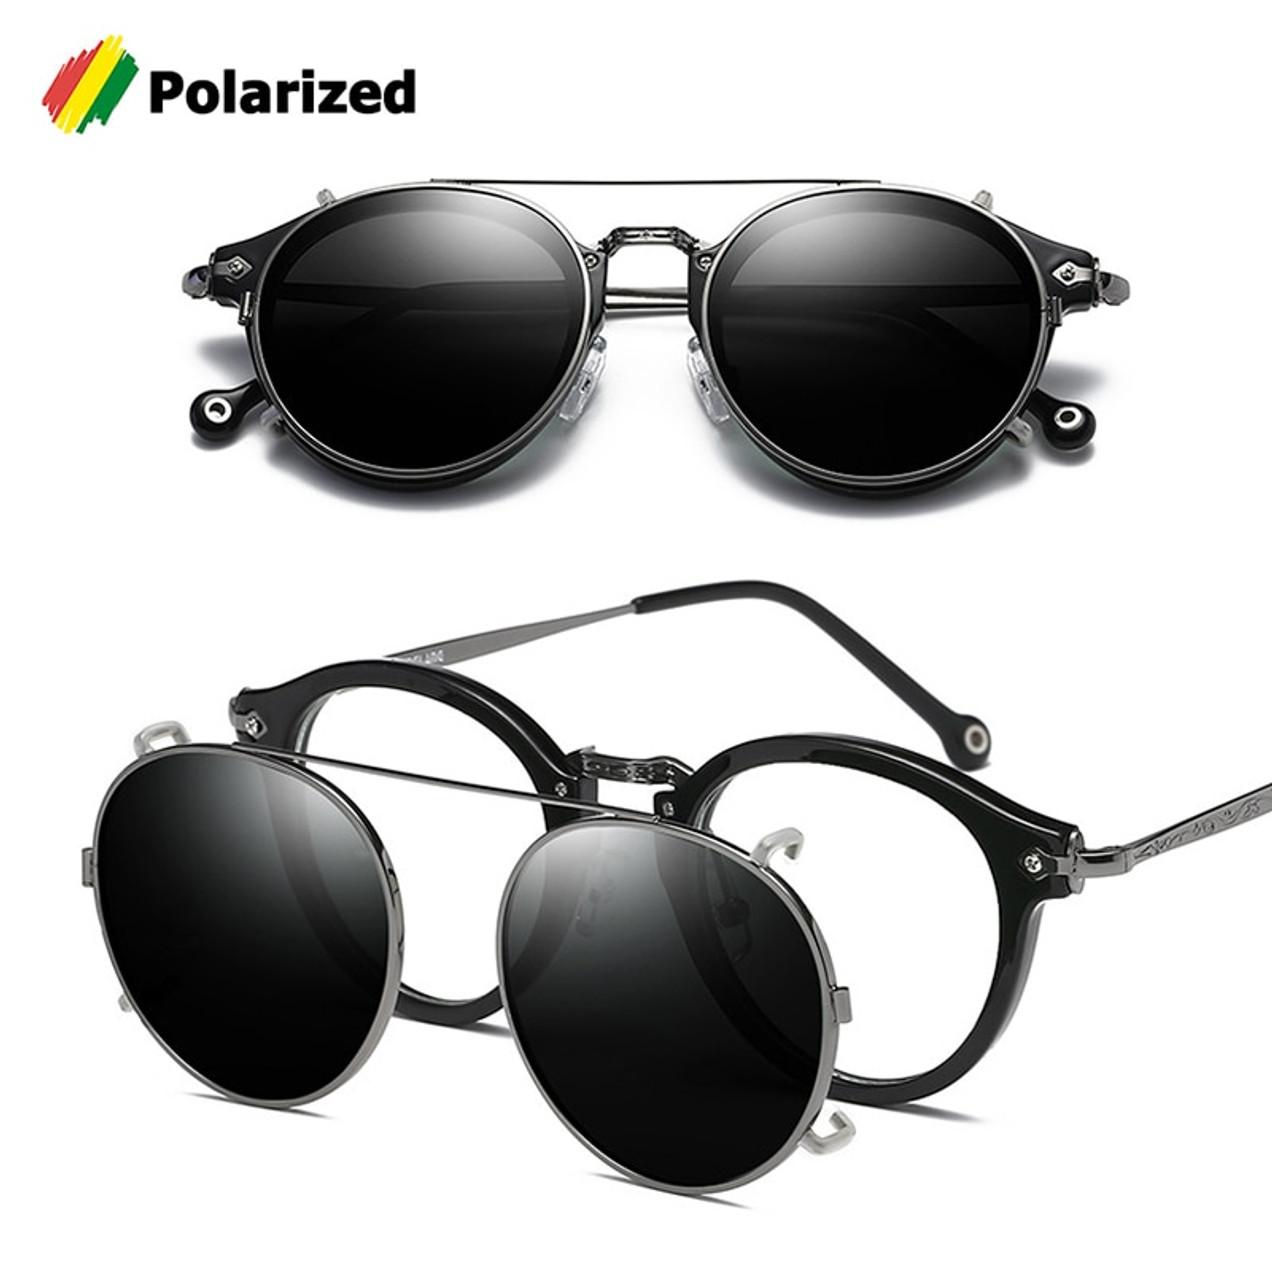 c1ad9d5d22 JackJad SteamPunk Vintage Round Style Polarized Sunglasses Clip On Lens  Removable Brand Designer Sun Glasses Oculos ...